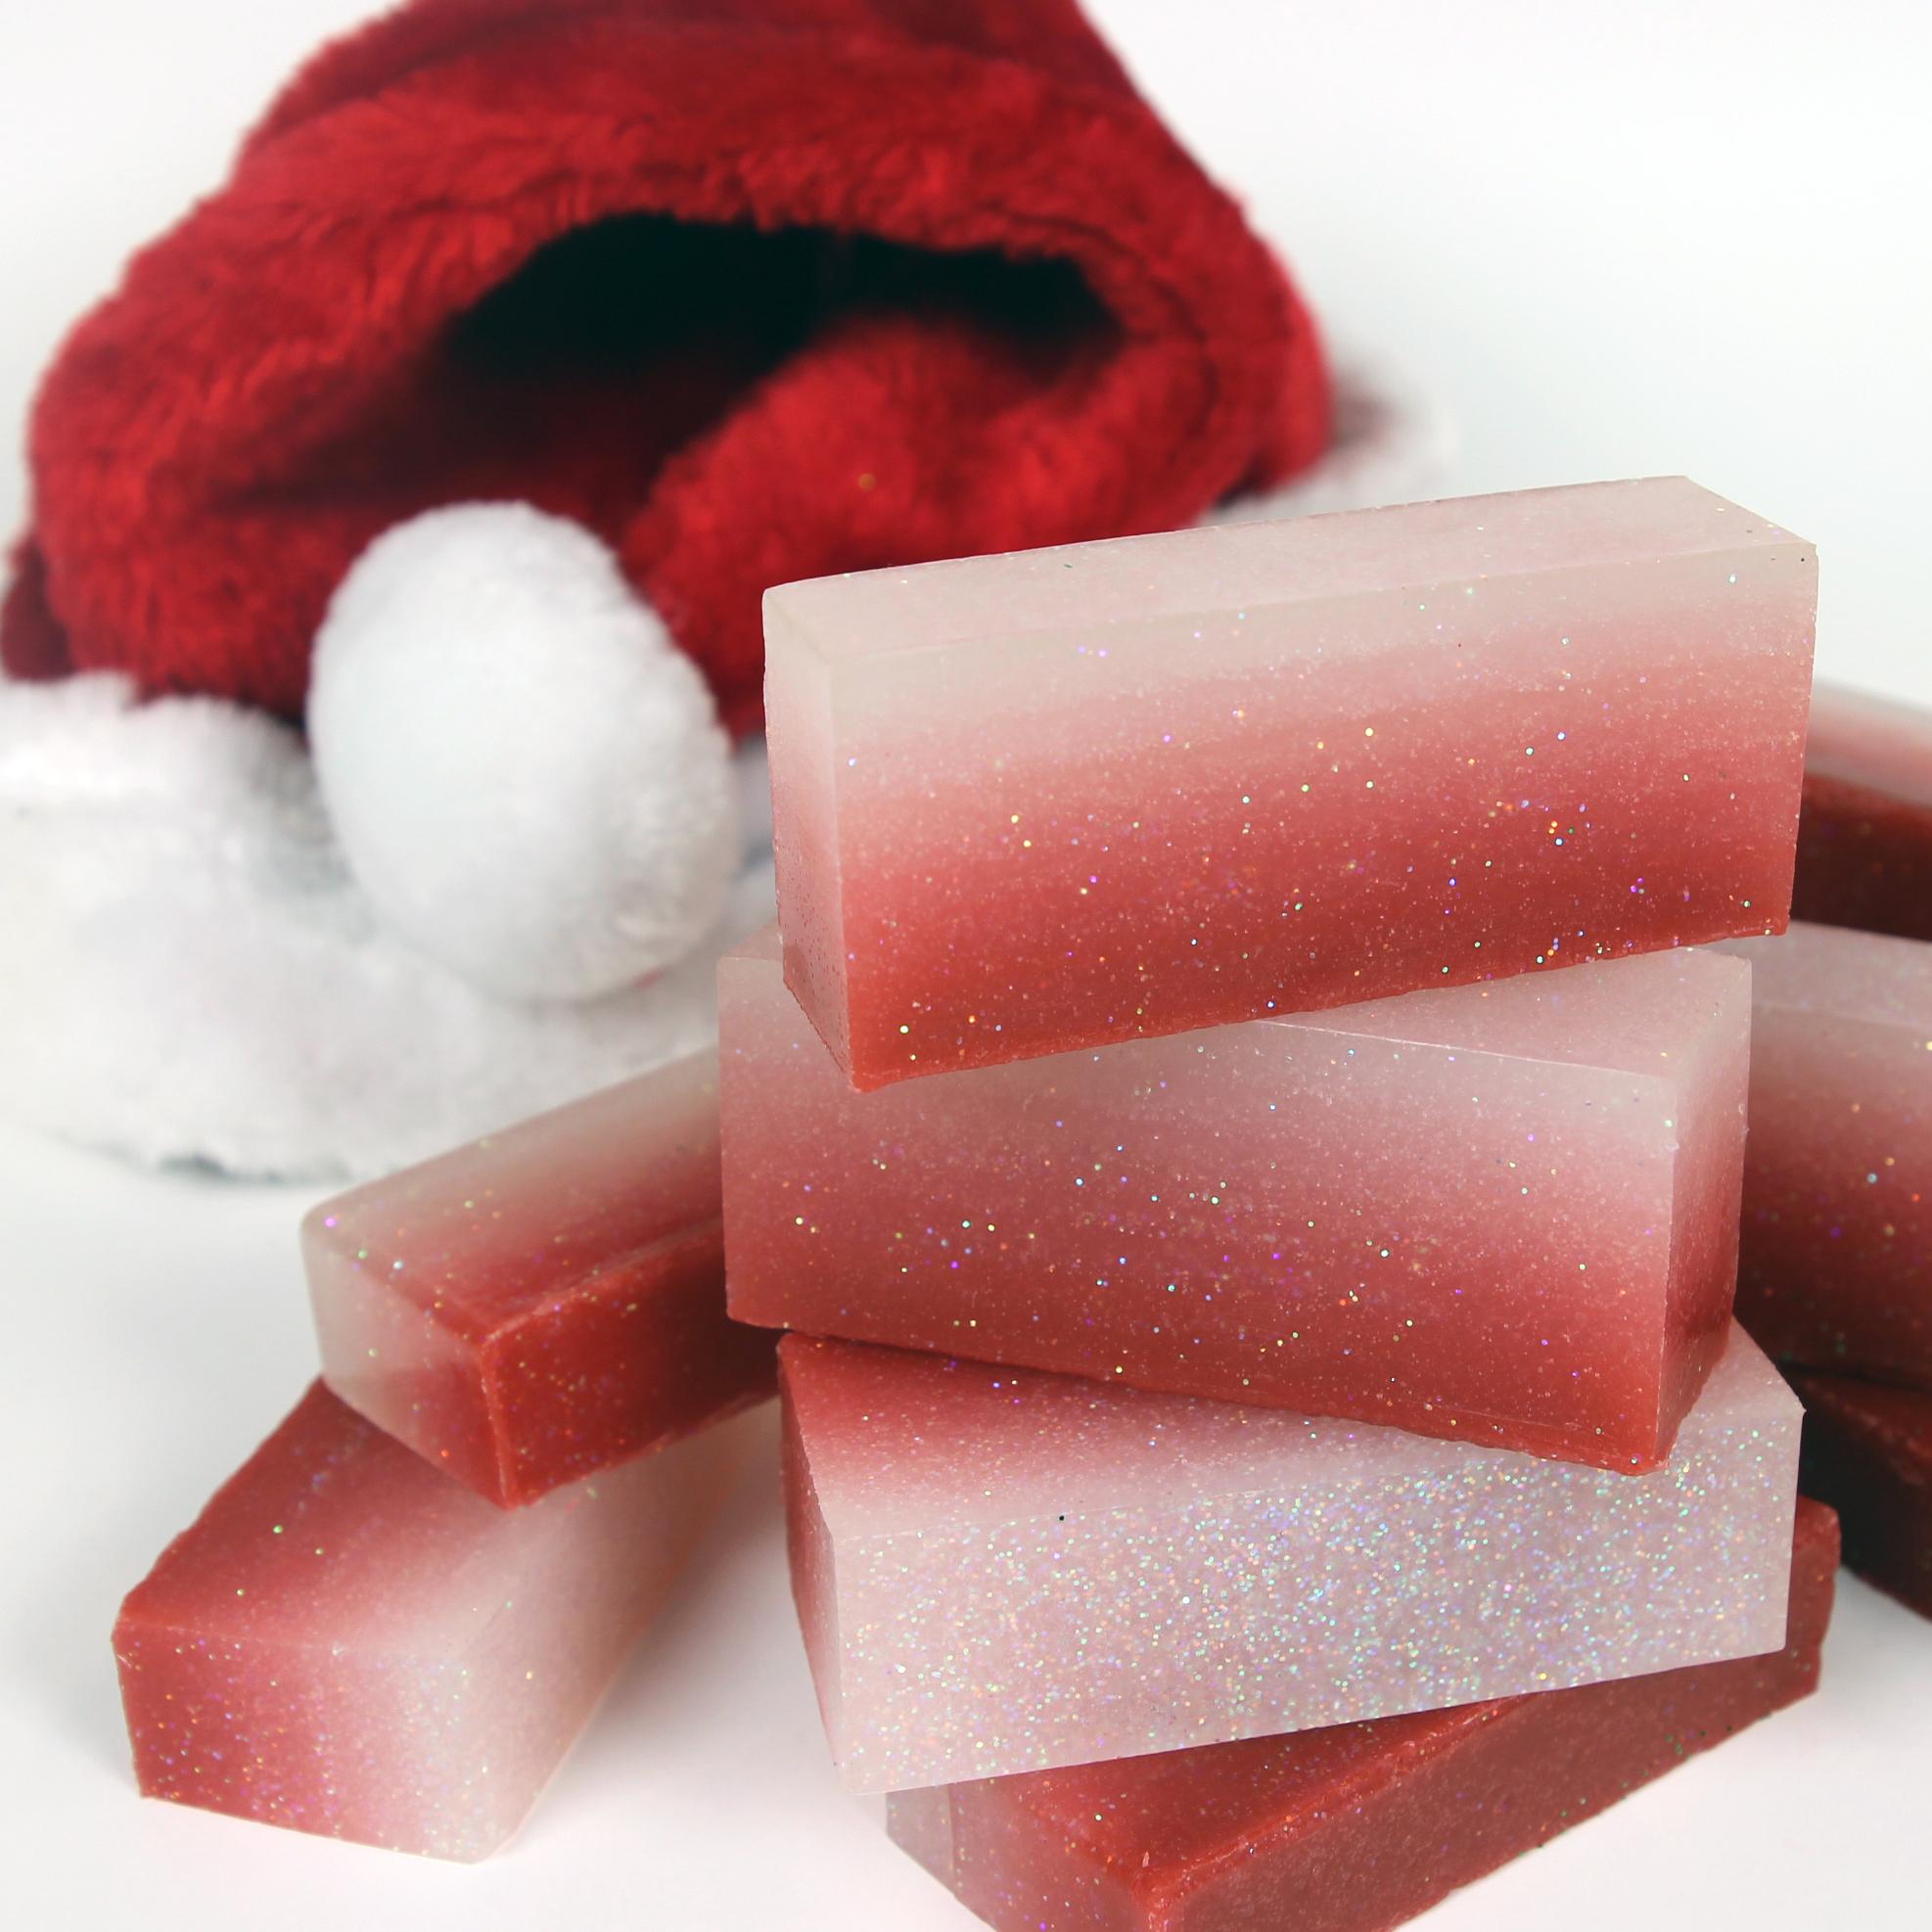 Домашнее мыло-порежьте на бруски